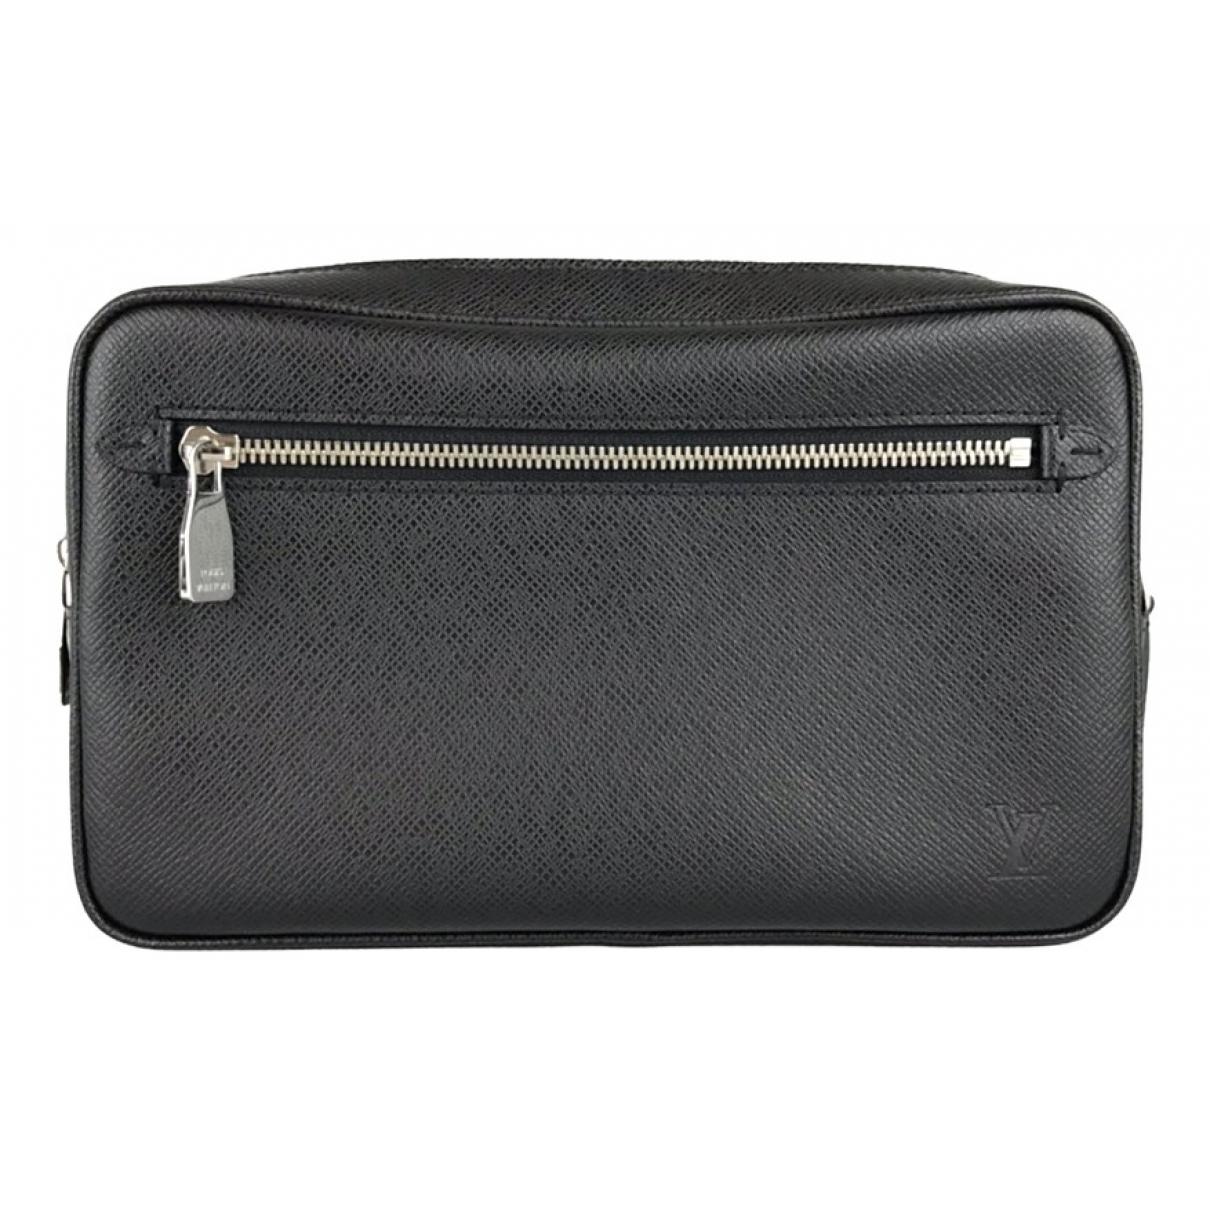 Louis Vuitton KasaÏ Black Leather Small bag, wallet & cases for Men N